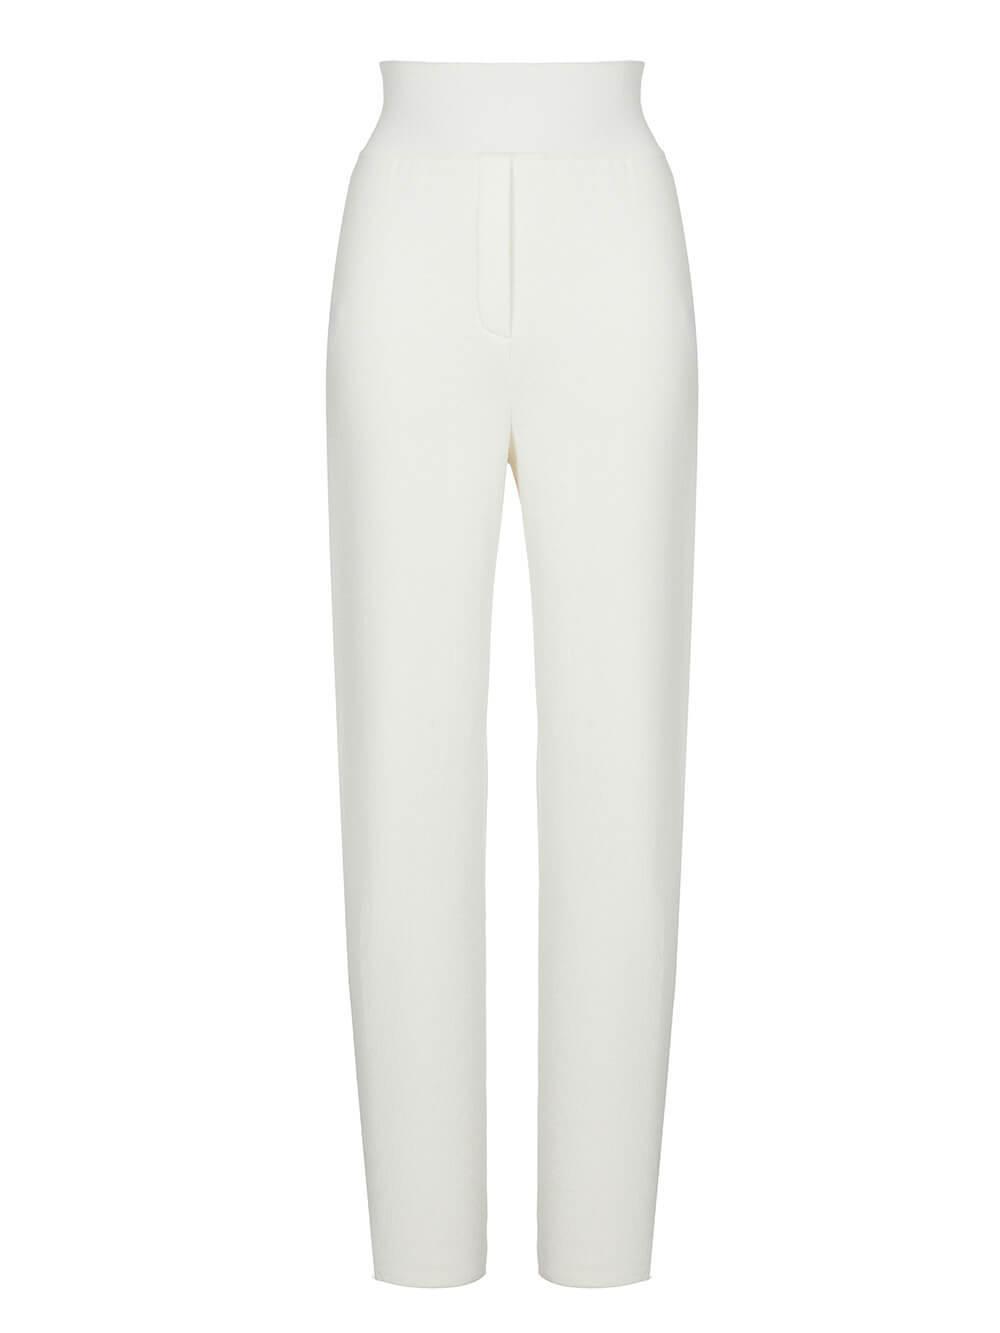 Женские брюки молочного цвета из шерсти и шелка - фото 1